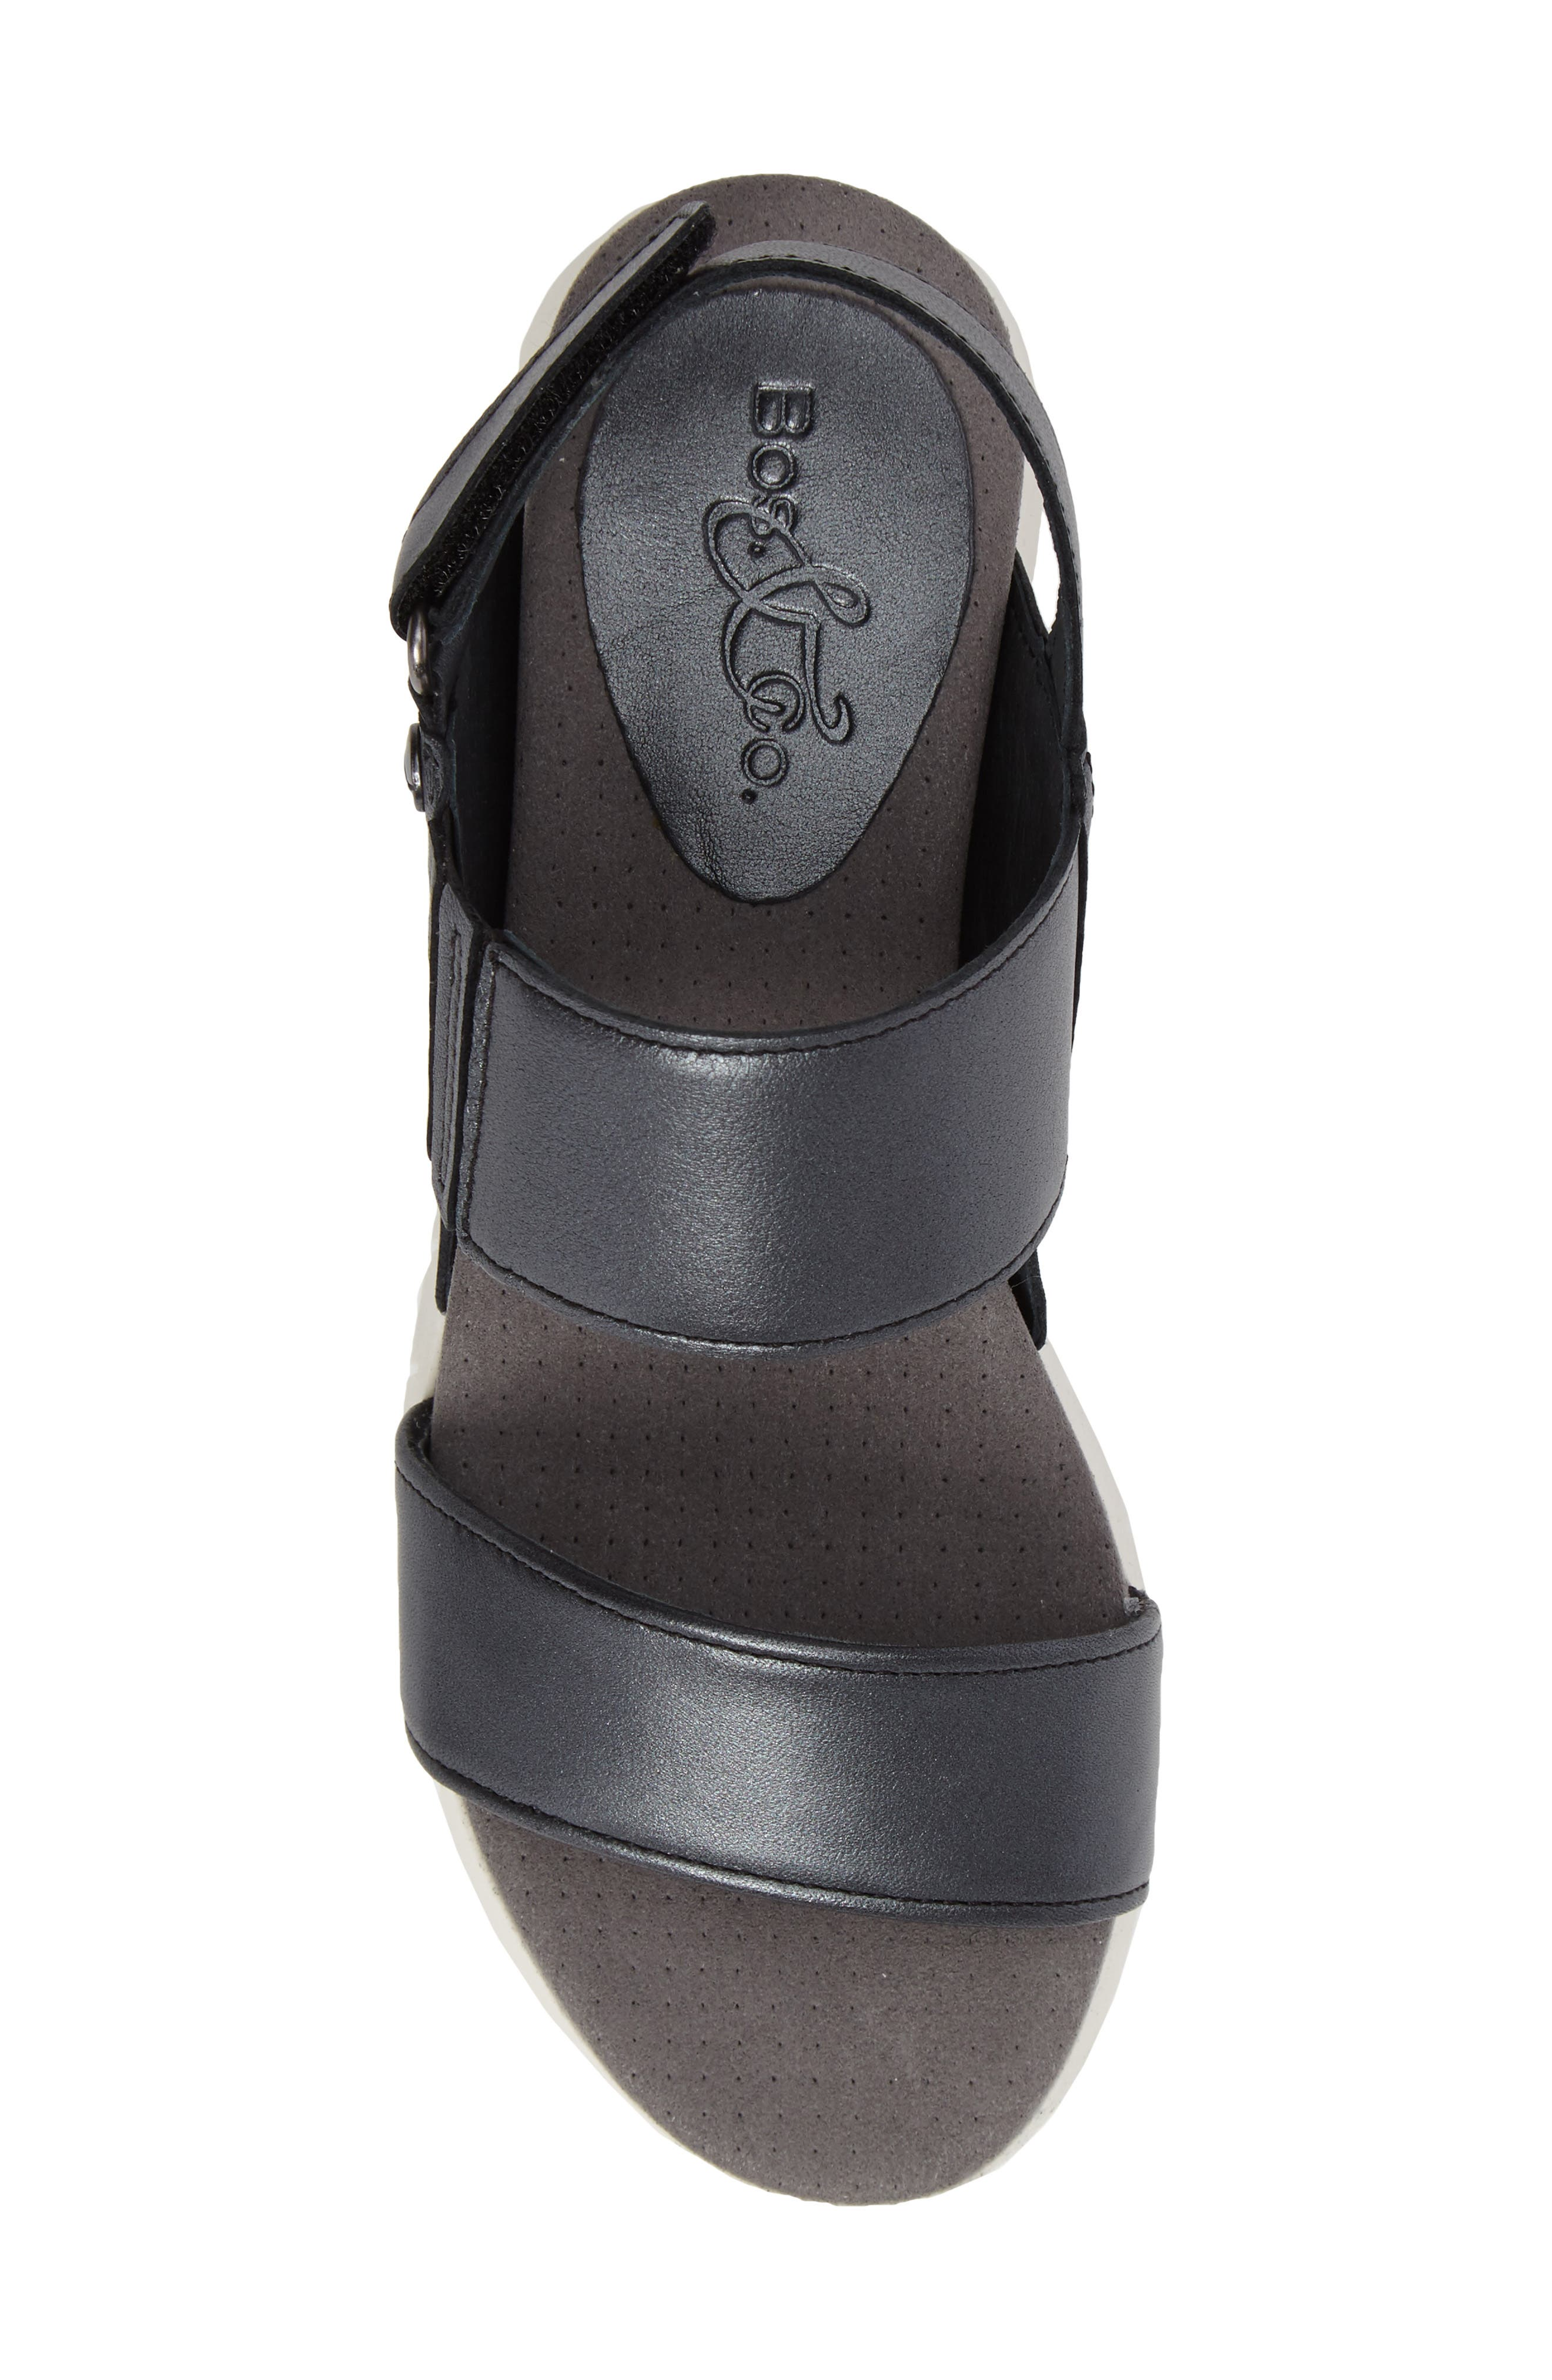 Payge Wedge Sandal,                             Alternate thumbnail 4, color,                             Black Leather